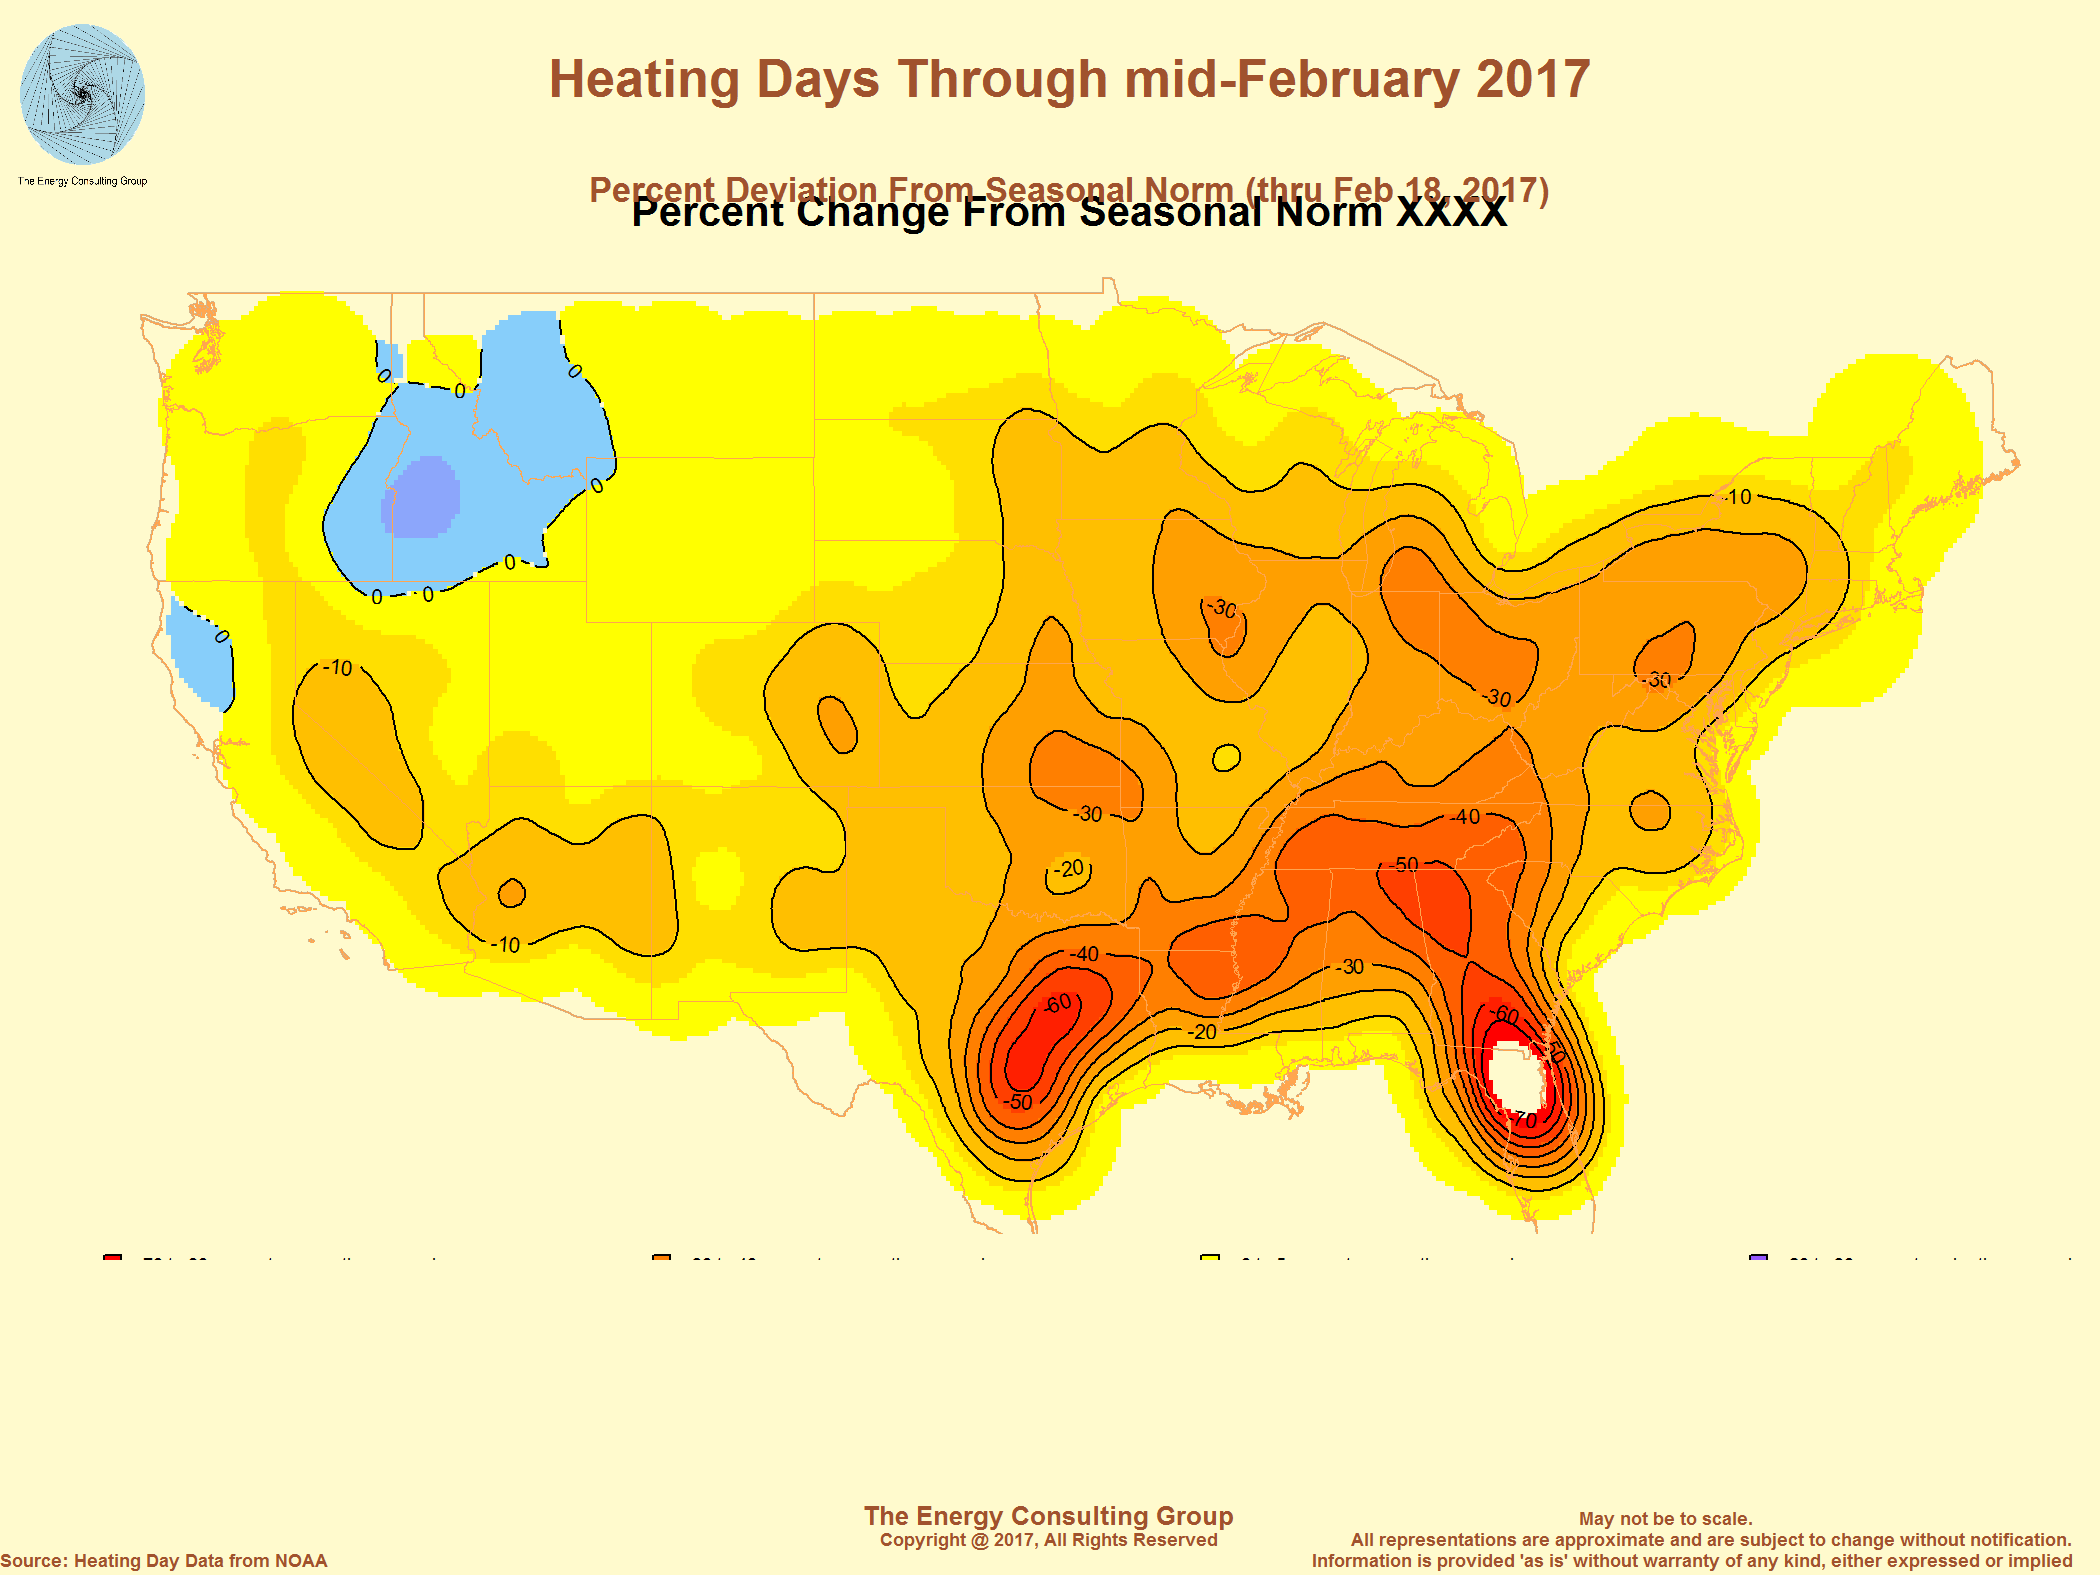 Usa Heating Day Through Mid February 2017